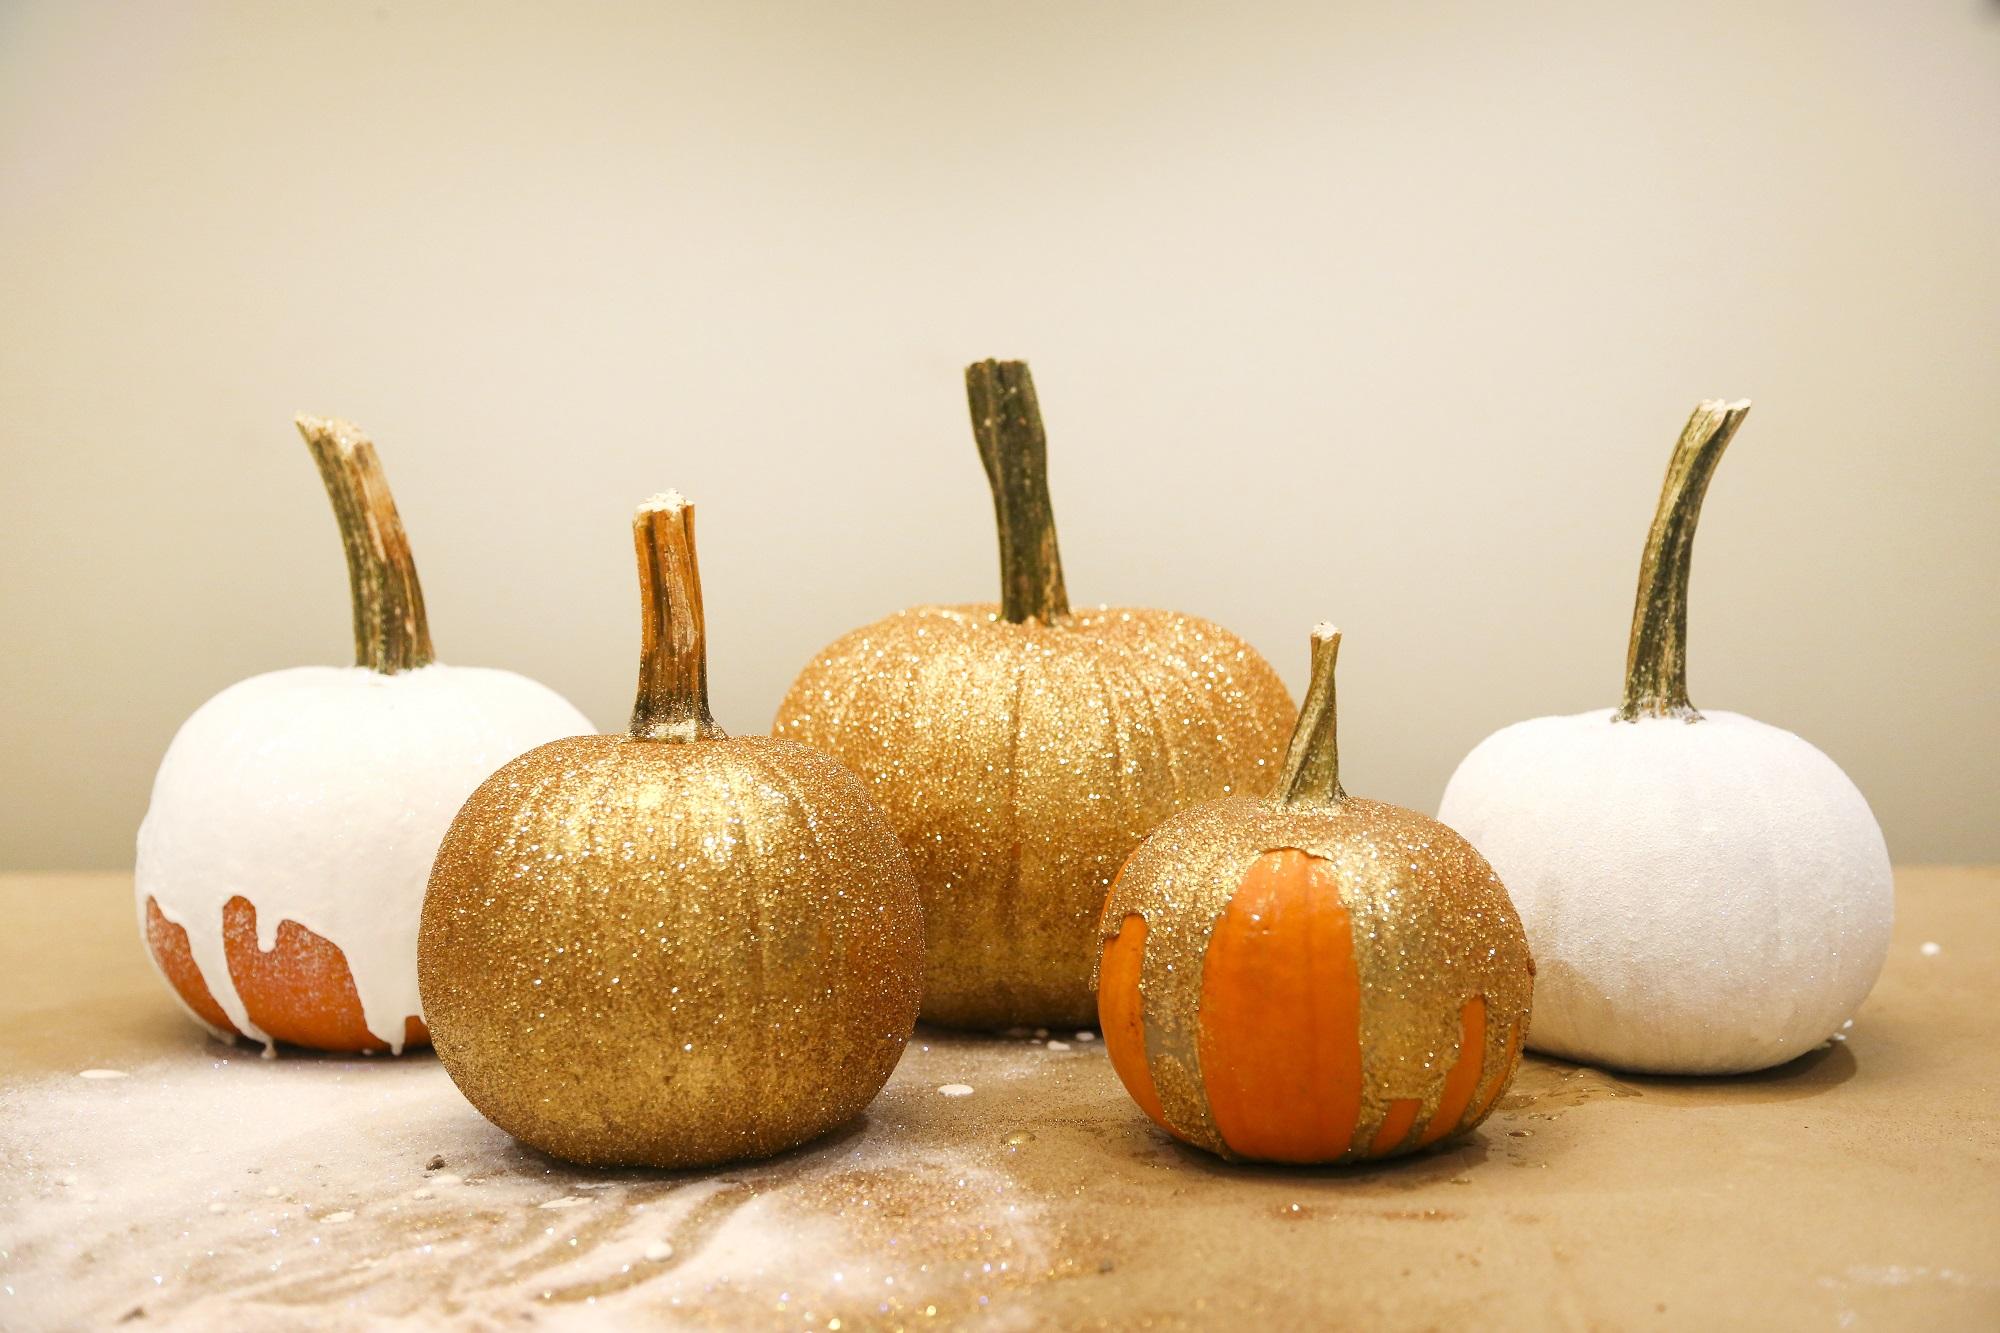 Gold and white glitter pumpkins